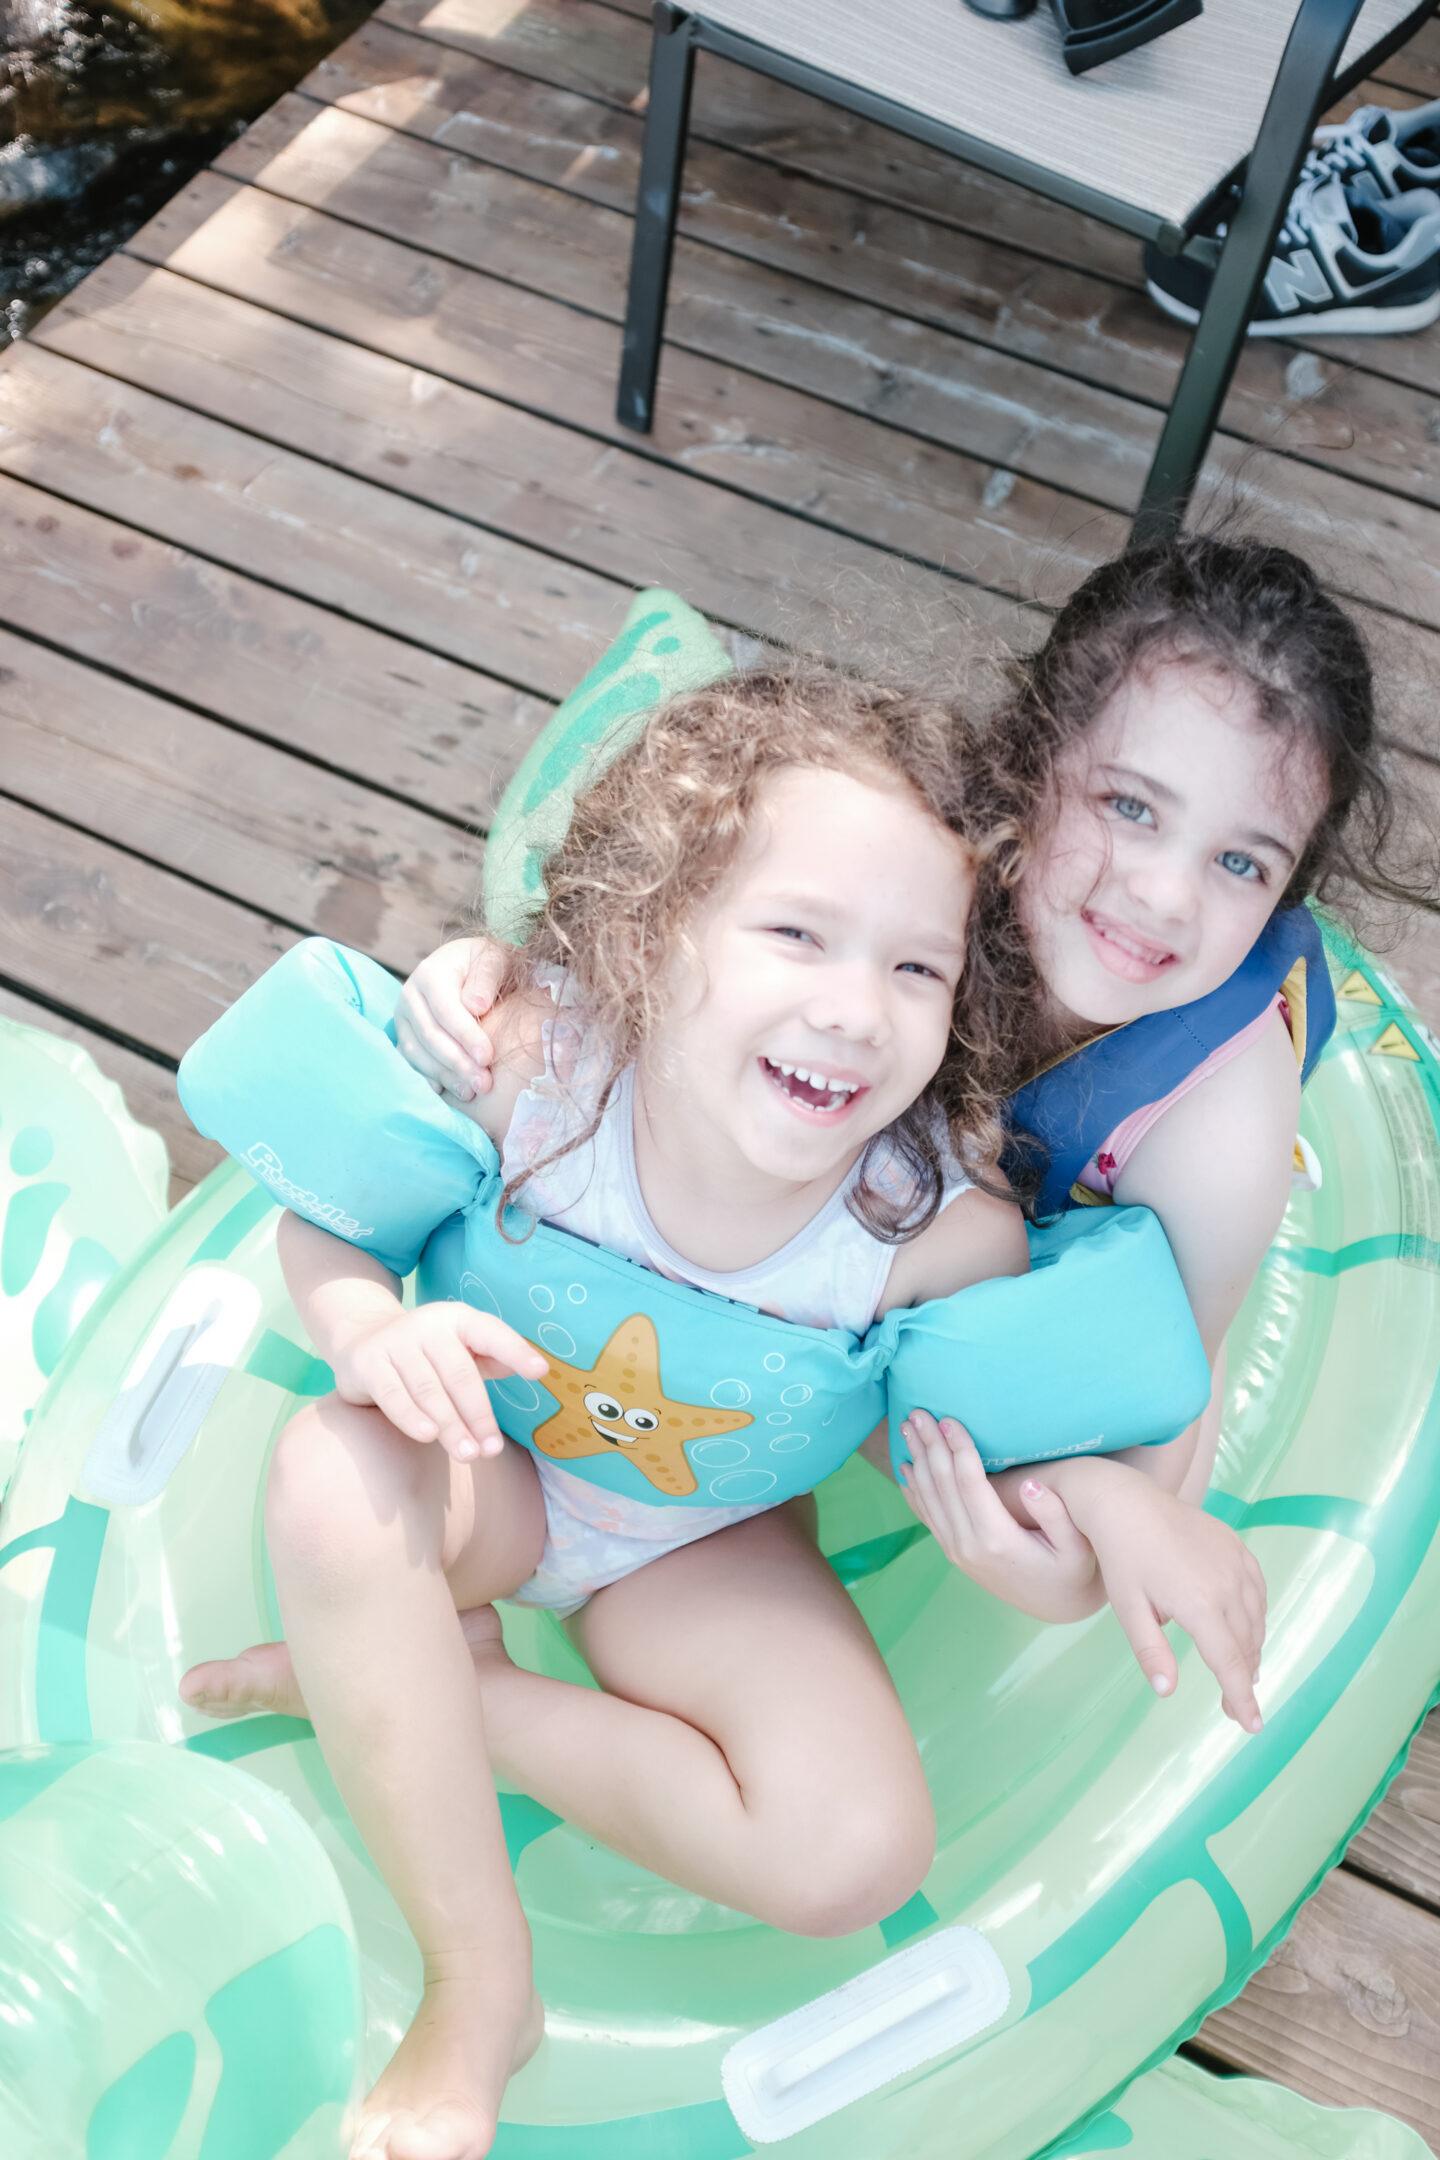 Summer adventures with kids